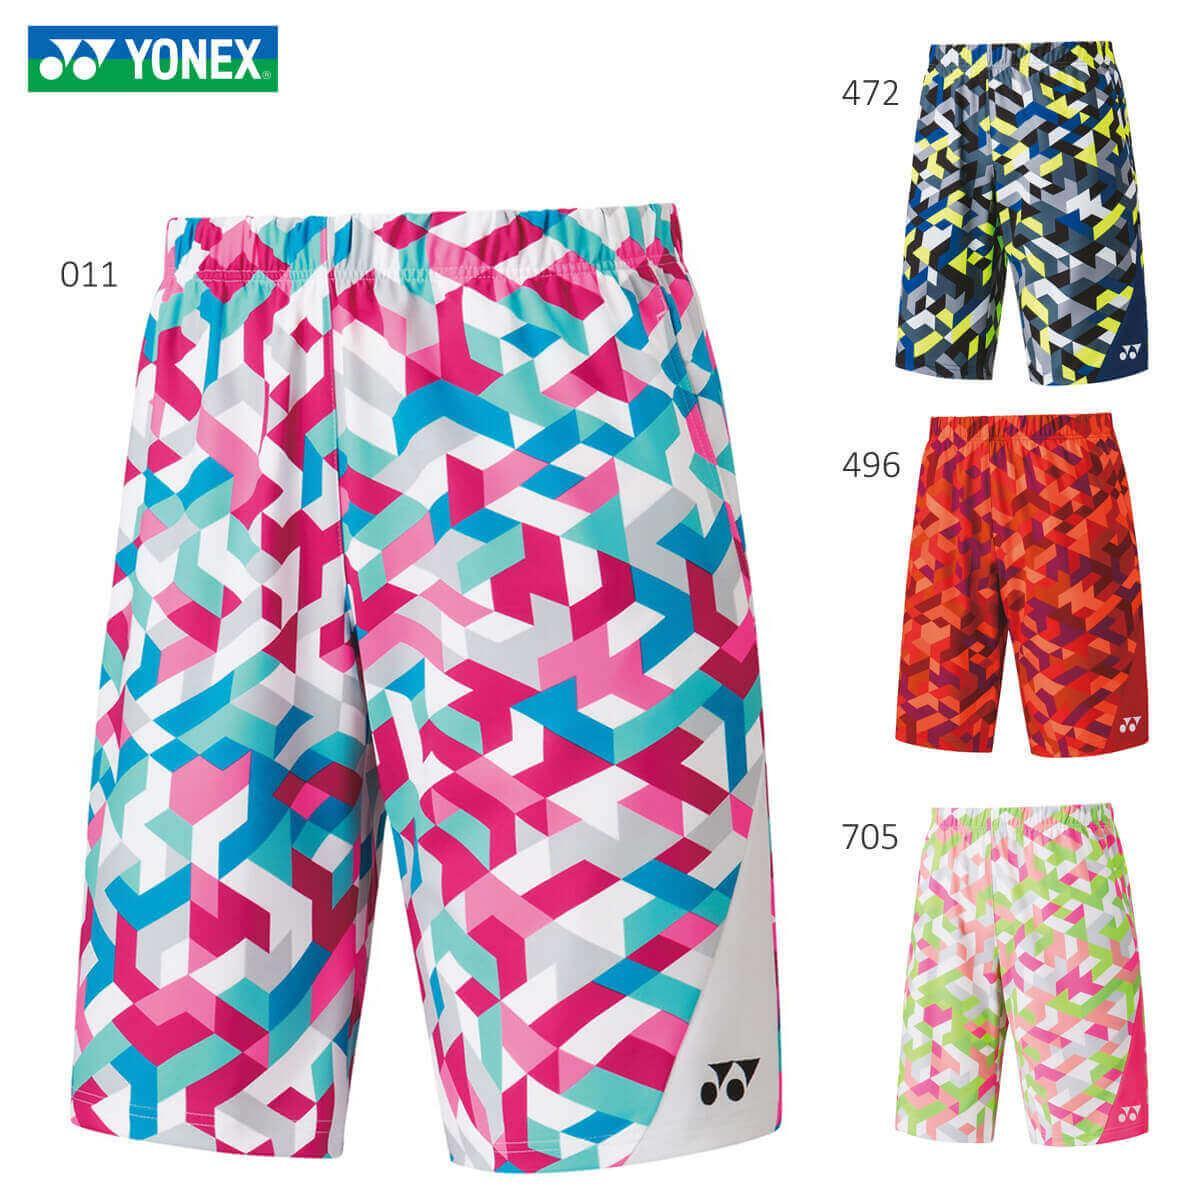 YONEX 15090 ニットハーフパンツ フィットスタイル ウェア メンズ バドミントン テニス メール便可 日本バドミントン協会審査合格品 2020年春夏モデル 取り寄せ 直送商品 贈与 ヨネックス